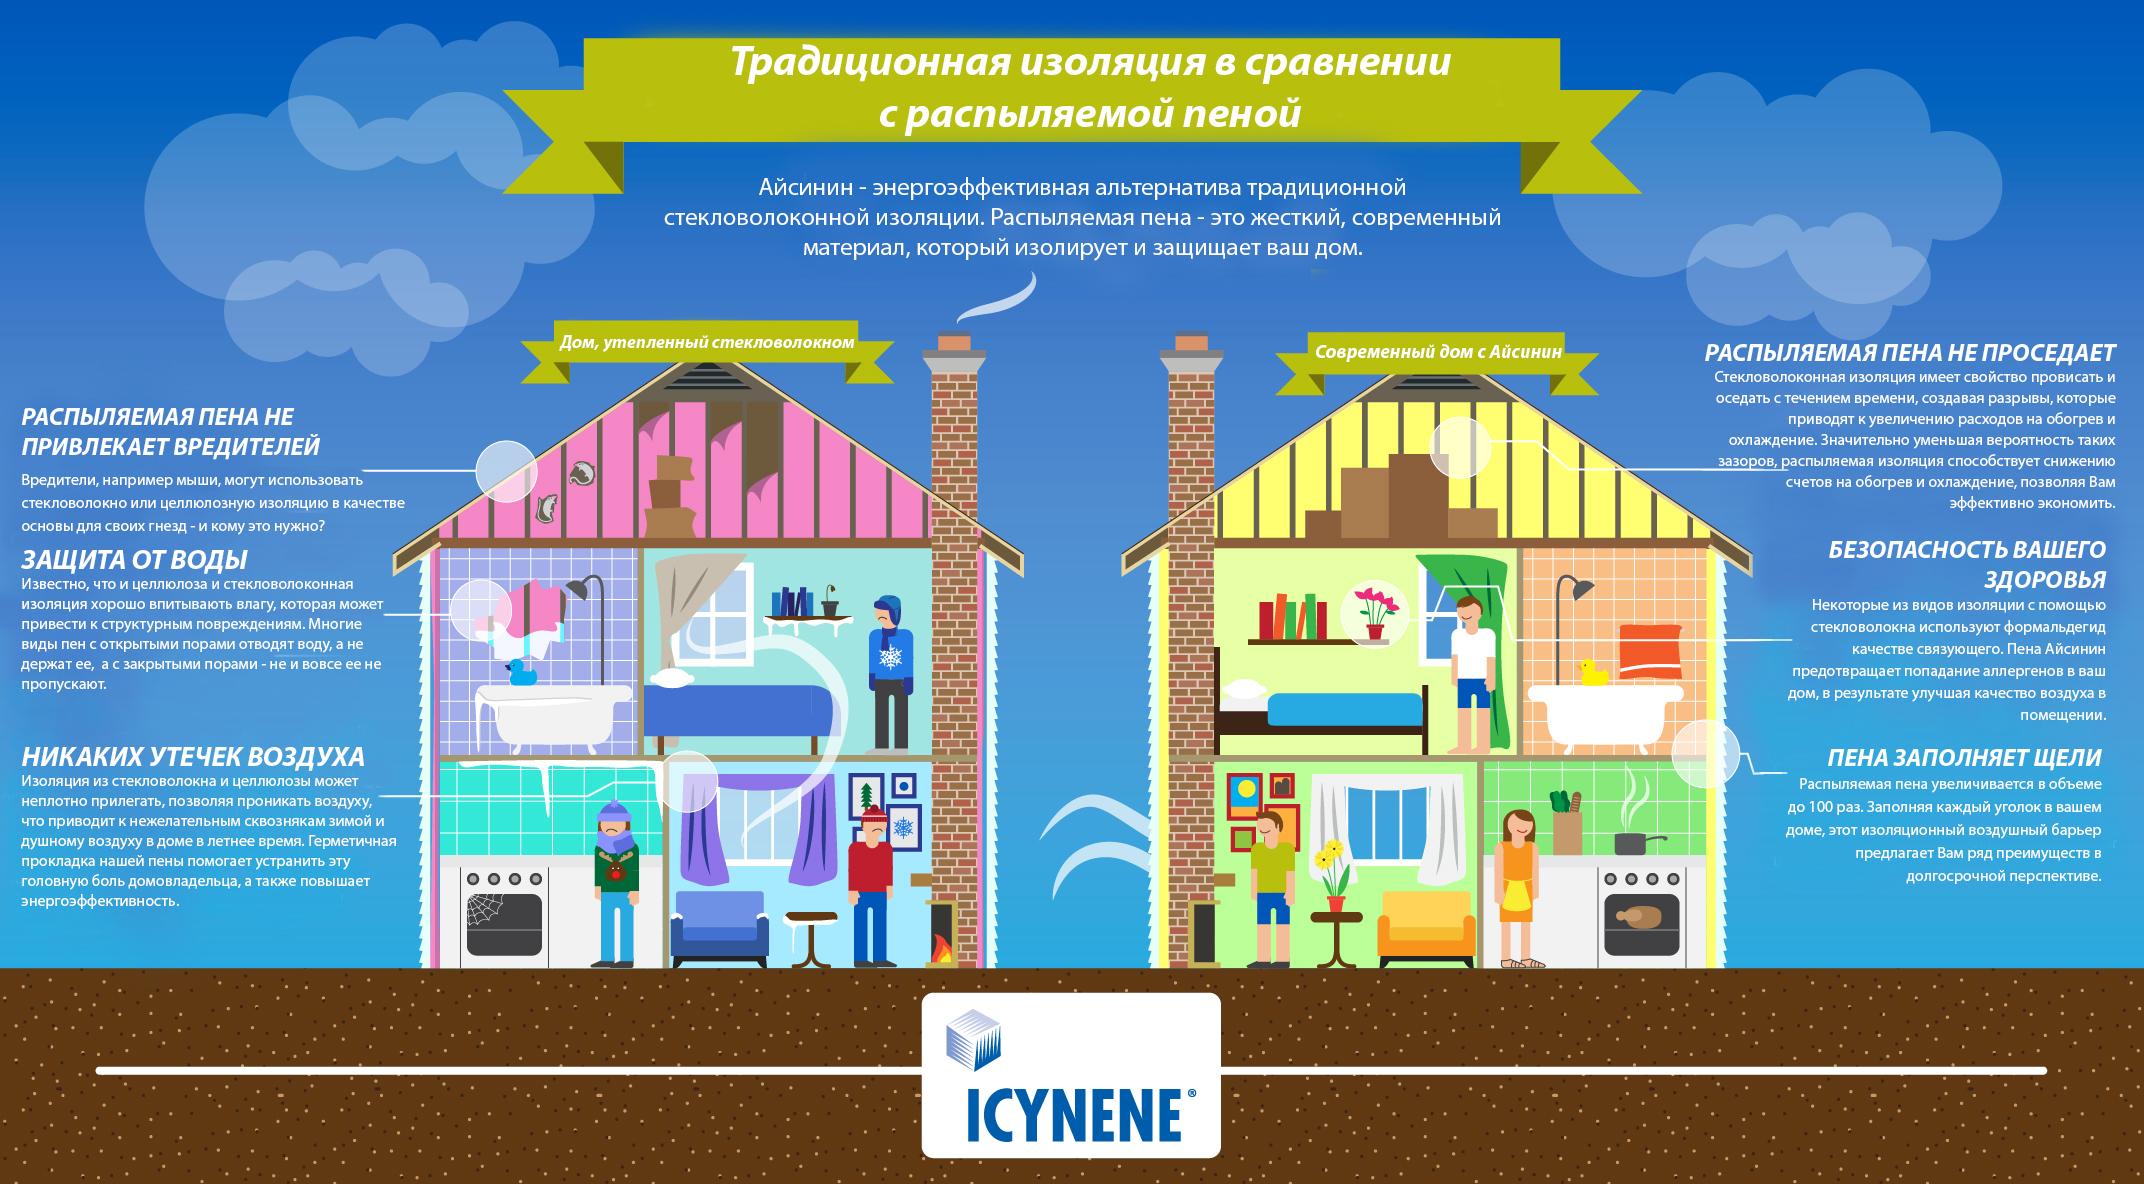 icynene-infographic_rus